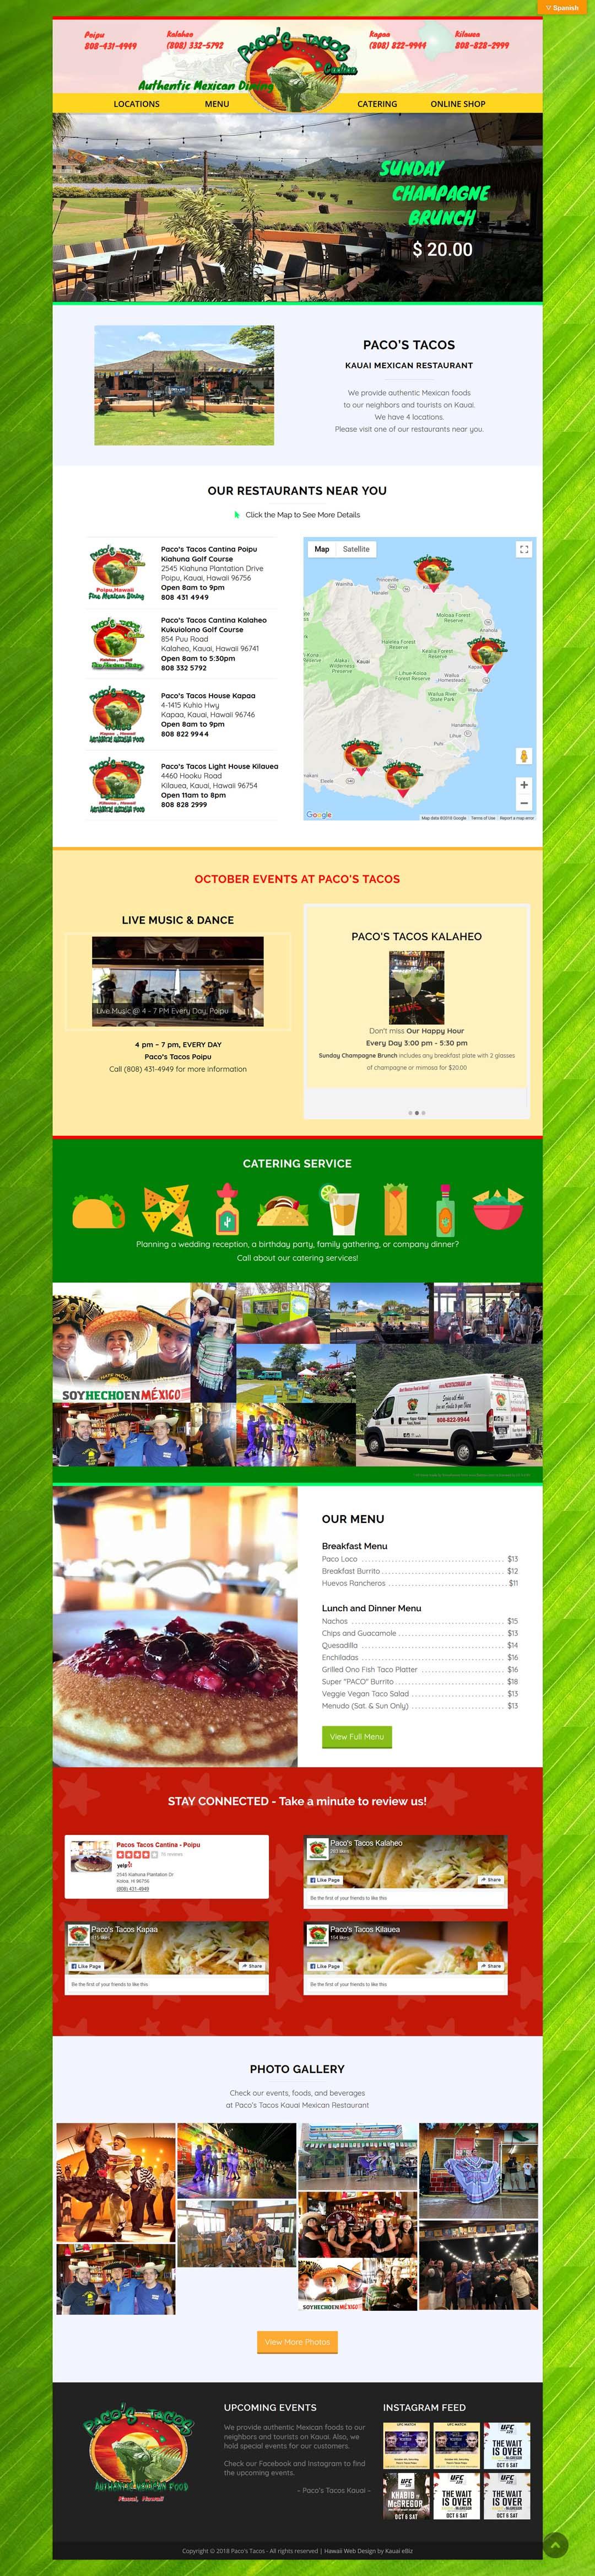 Paco's Tacos Online Shop